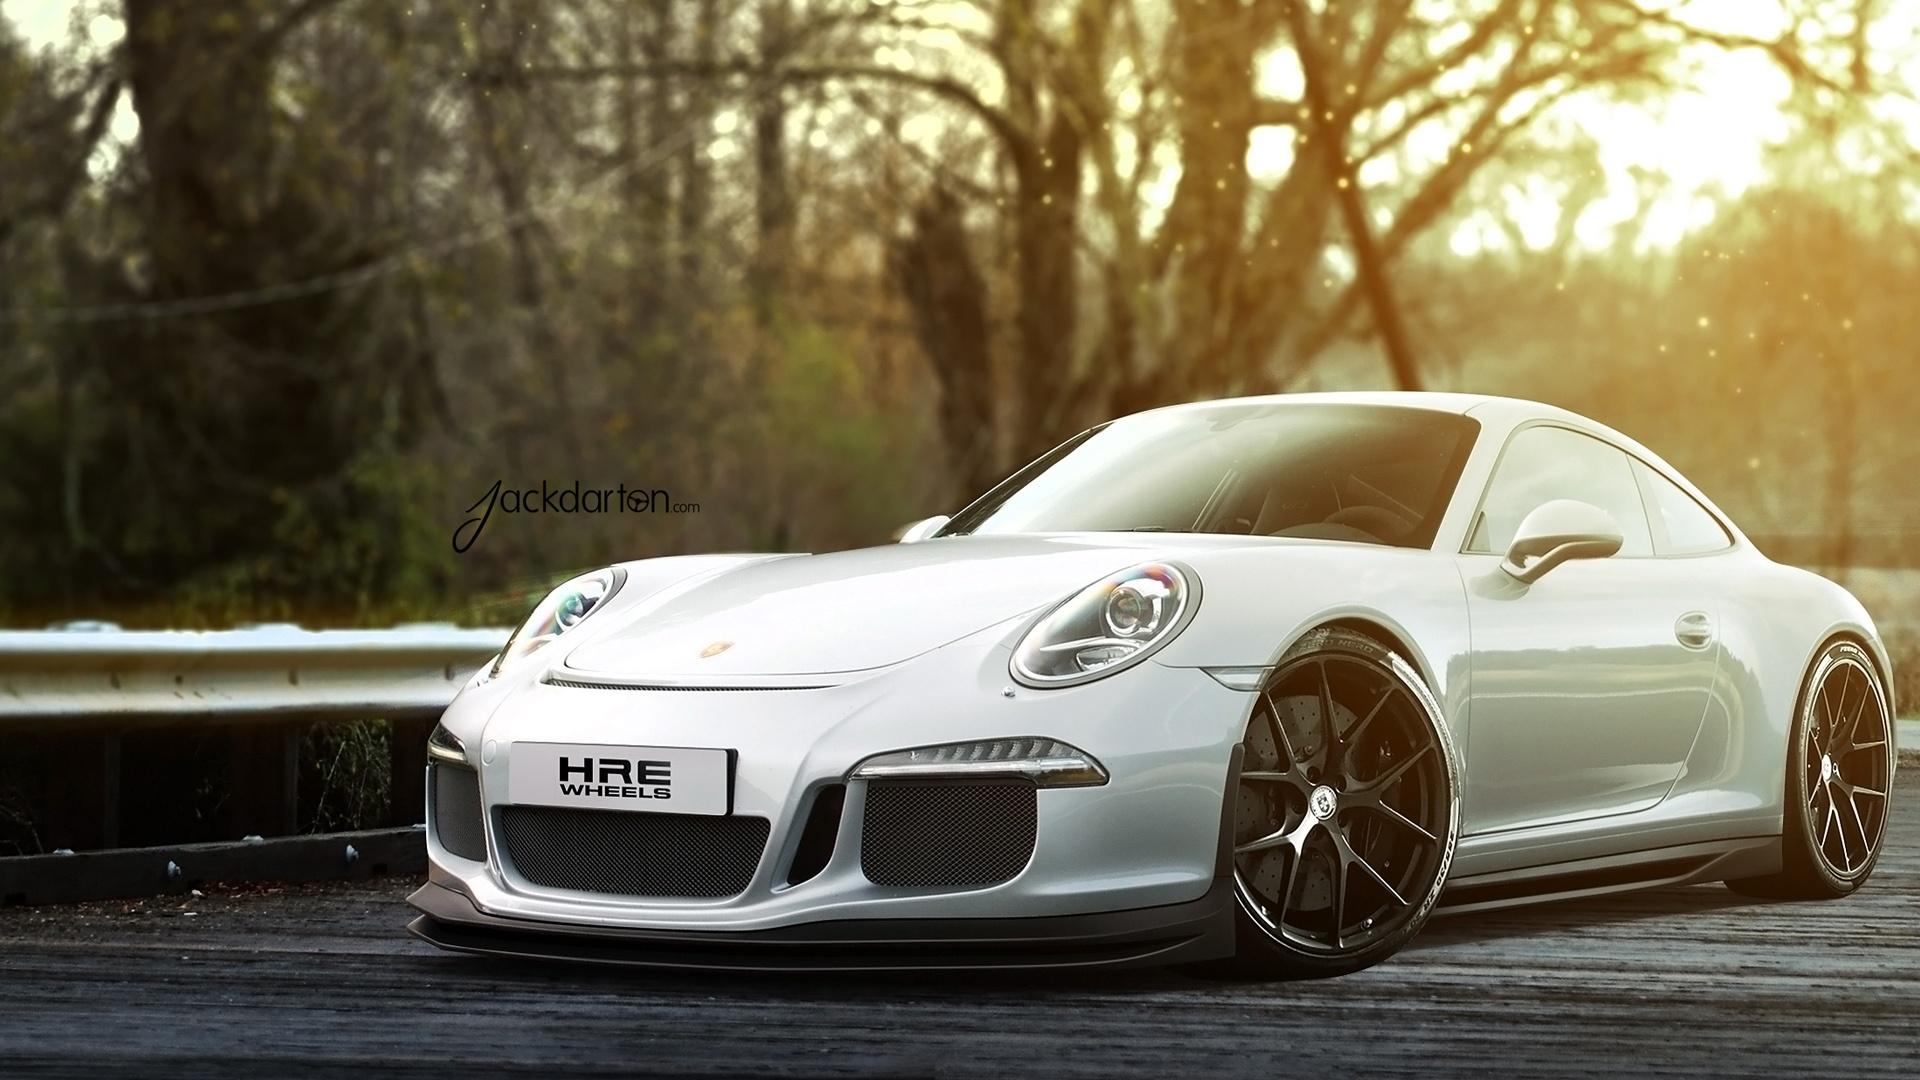 Free Download Porsche 911 Gt3 Wallpapers Hd Wallpapers 1920x1080 For Your Desktop Mobile Tablet Explore 68 Gt3 Wallpaper Porsche 911 Wallpaper Porsche Gt3 Rs Wallpaper Porsche Screensavers And Wallpaper